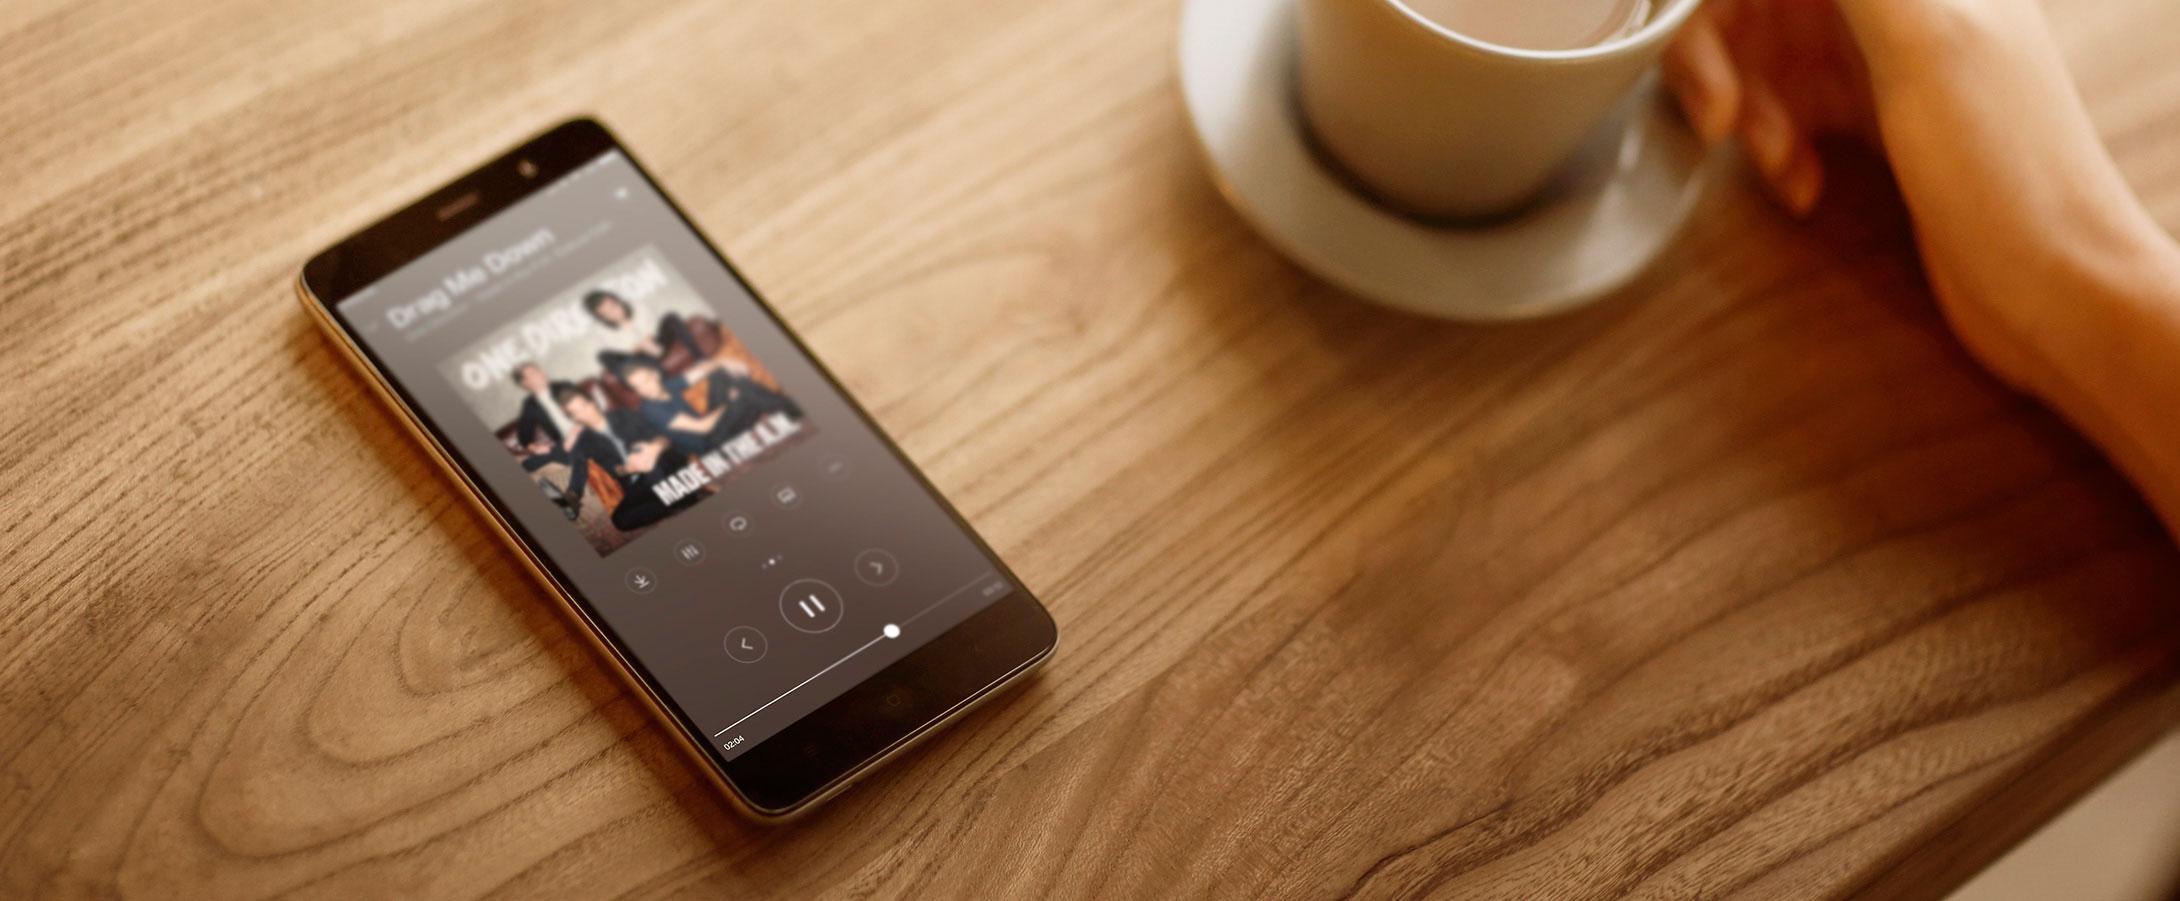 Should You Charge Your Phone Overnight Tips Tricks Mi Redmi 5a Ram Garansi Resmi Tam